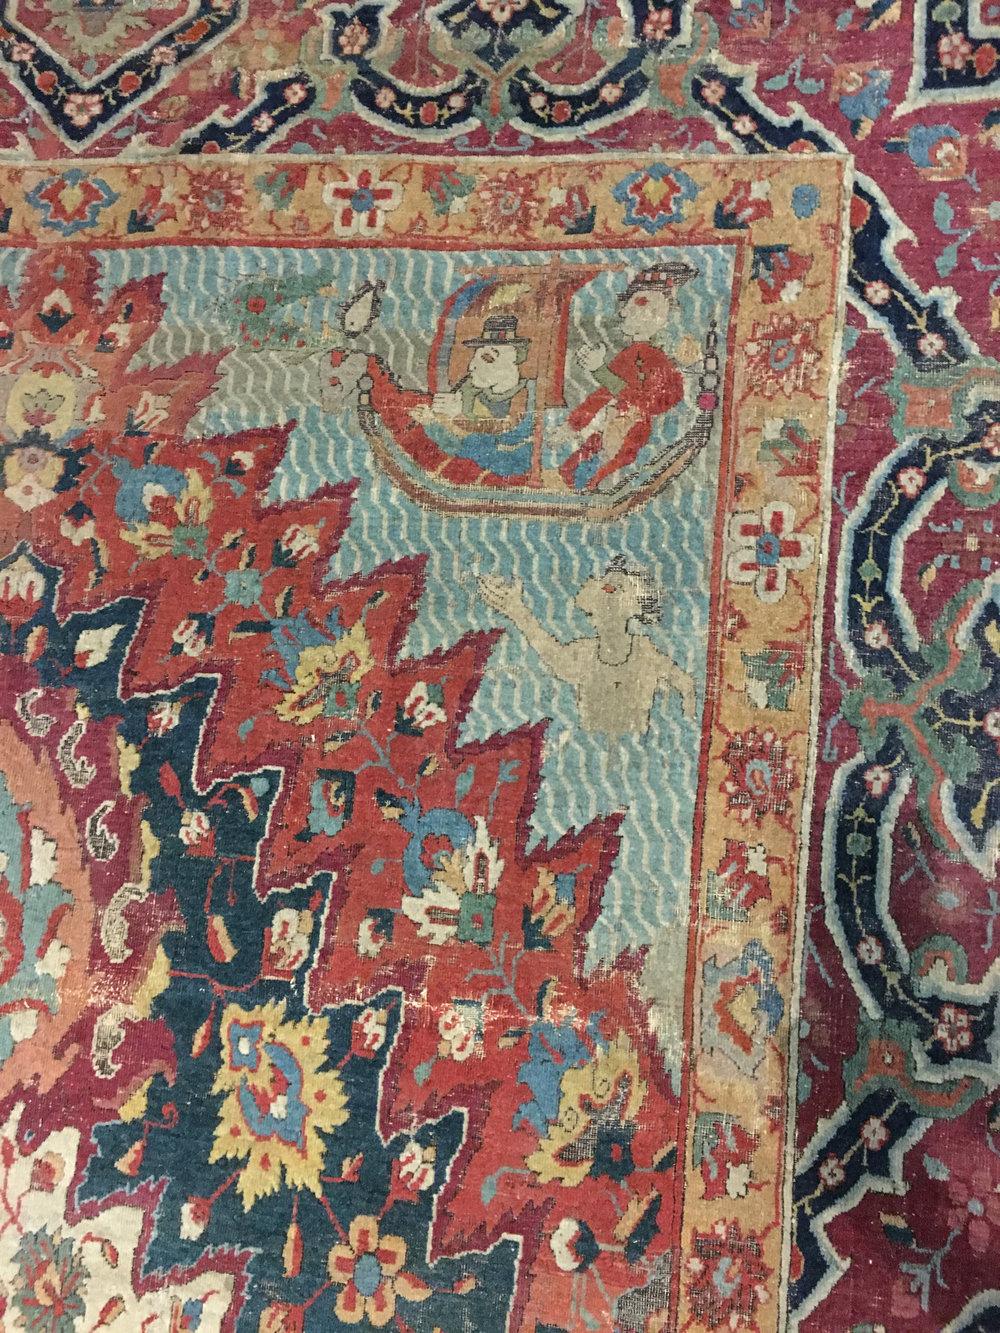 "Detail of one corner, ""Portuguese carpet"", Persia, Khorasan?, 17th century, Safavid period, wool pile. Calouste Gulbenkian Museum, Lisbon (Photograph J. Cook)"